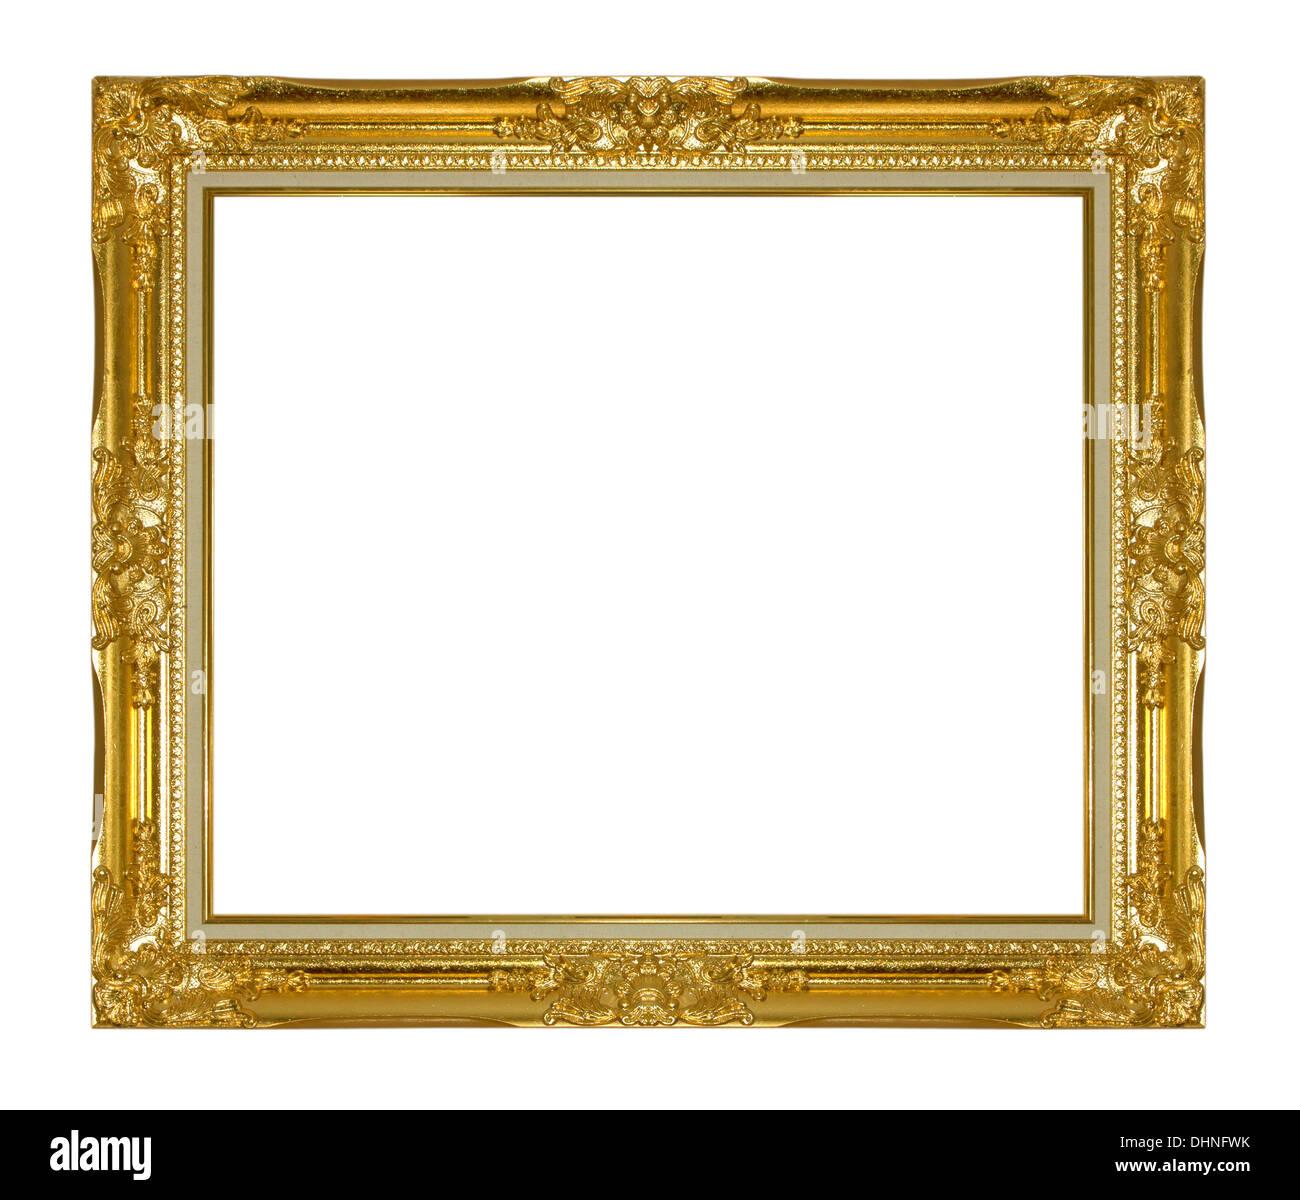 Gold vintage frame isolated on white background - Stock Image